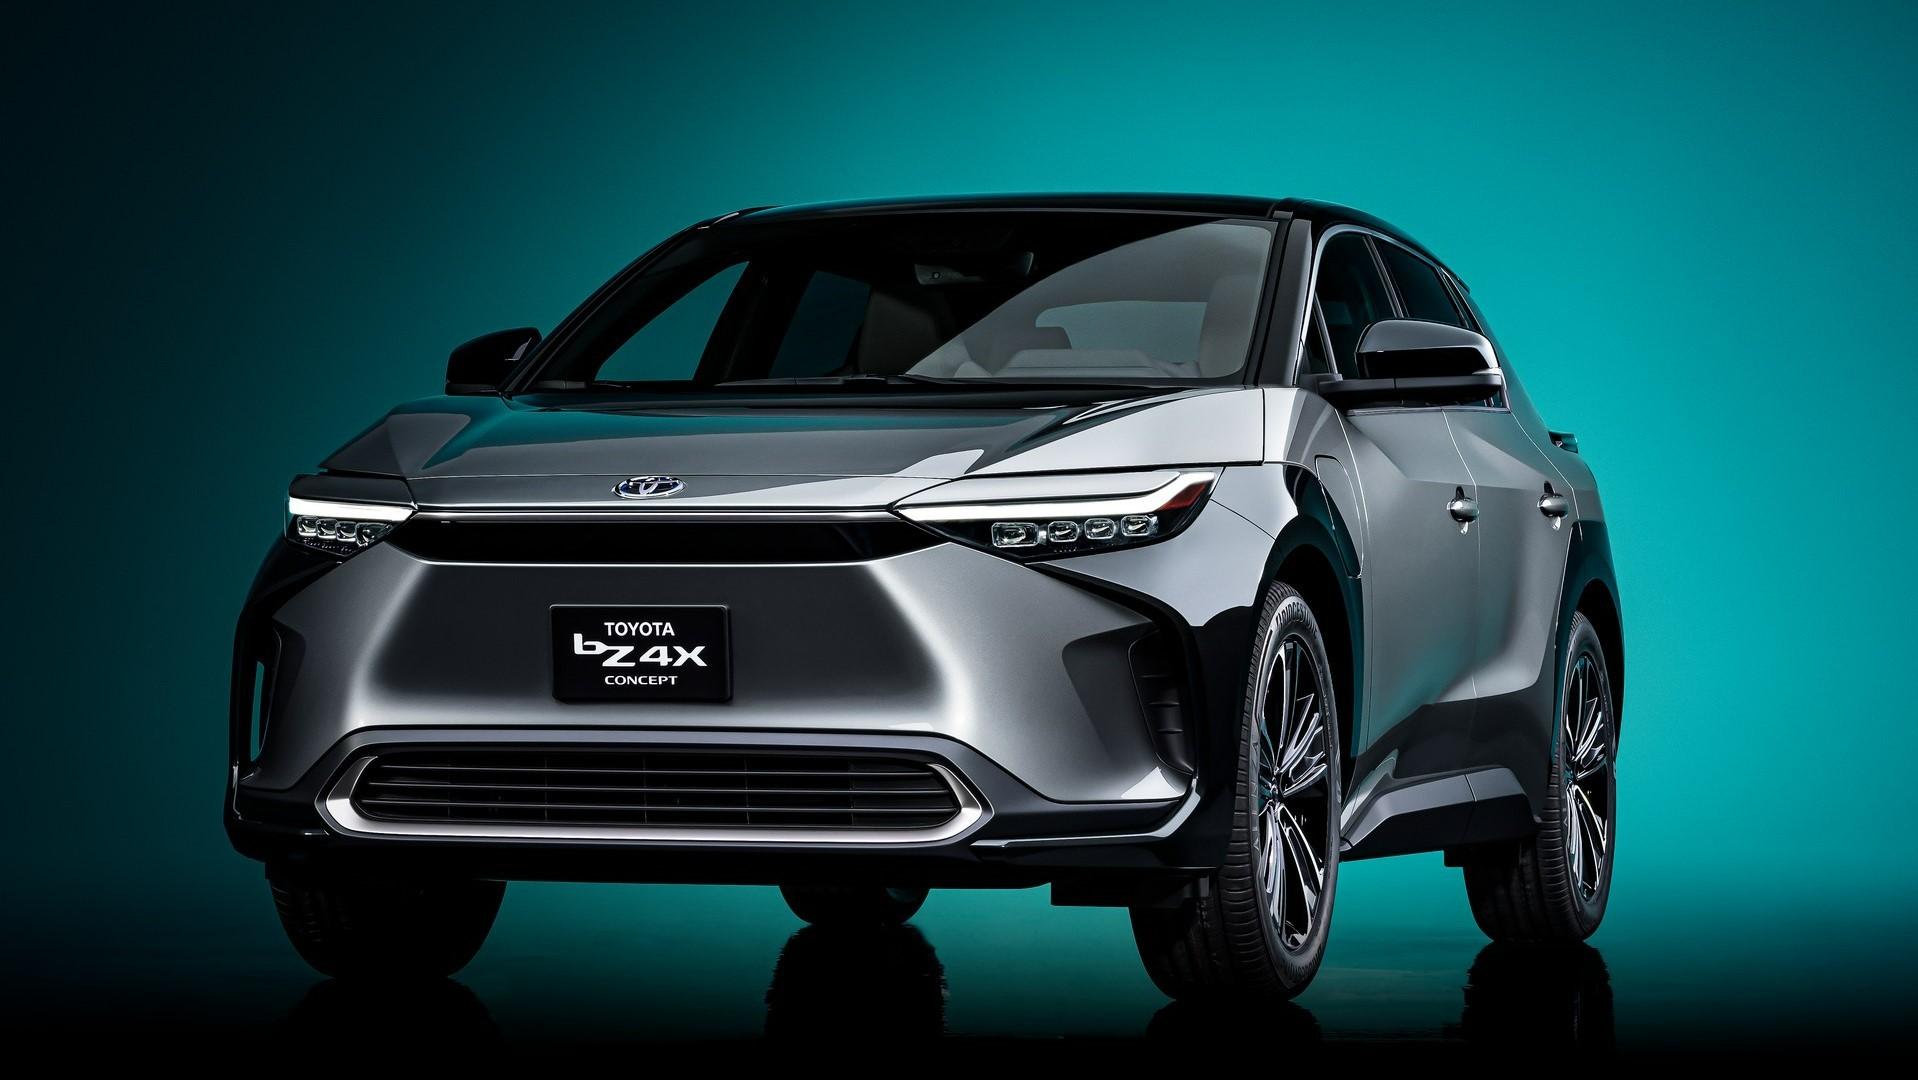 Toyota bZ4X Concept 2021 (4)